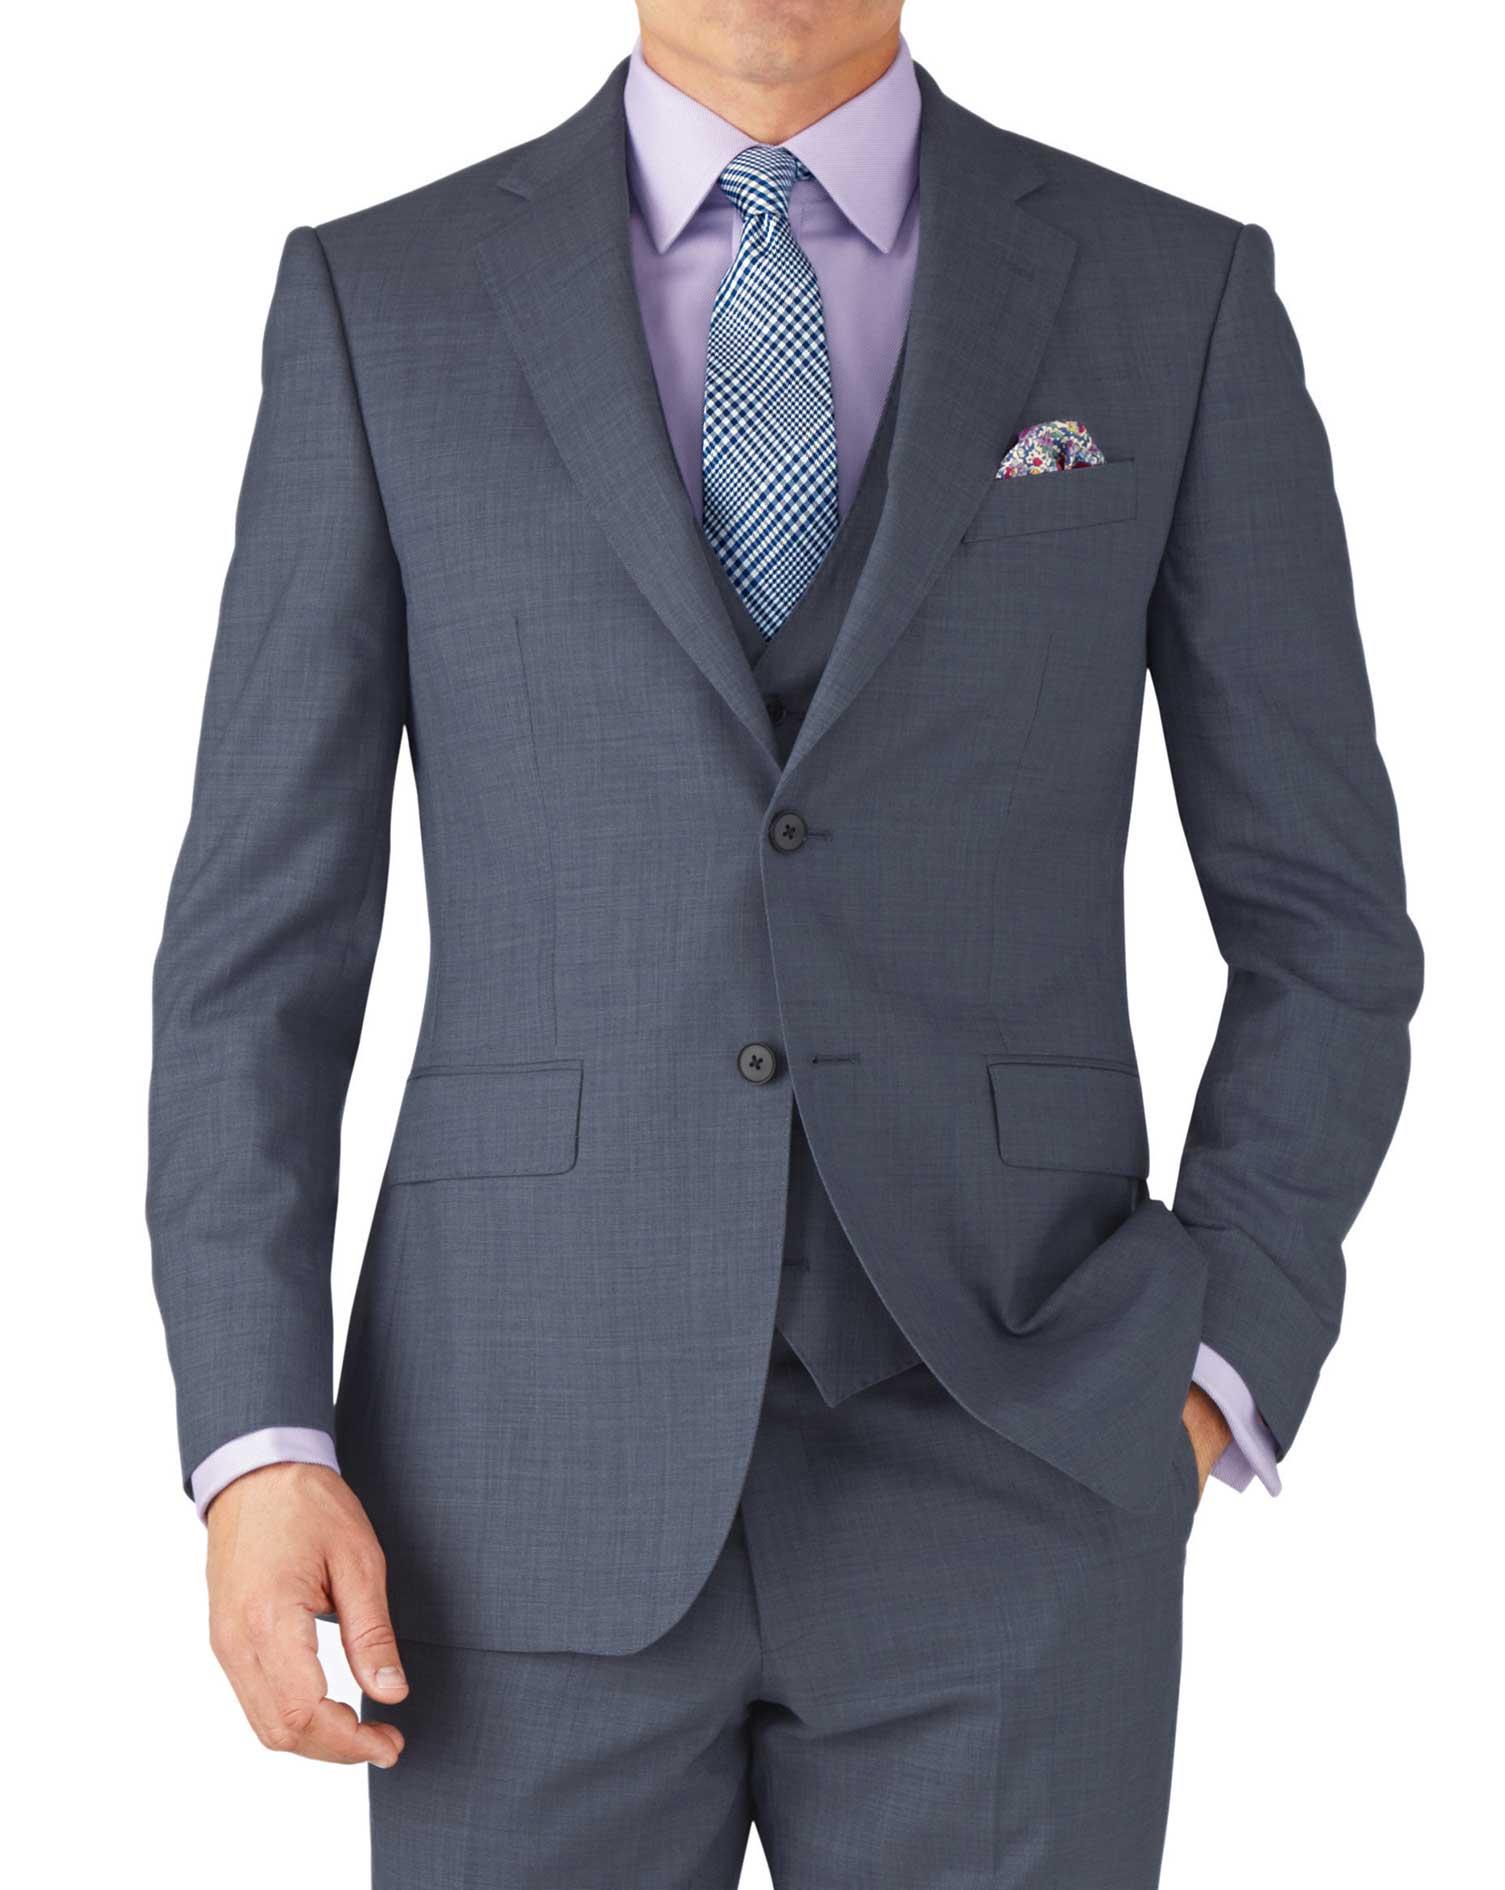 Light Blue Classic Fit Sharkskin Travel Suit Wool Jacket Size 40 Long by Charles Tyrwhitt